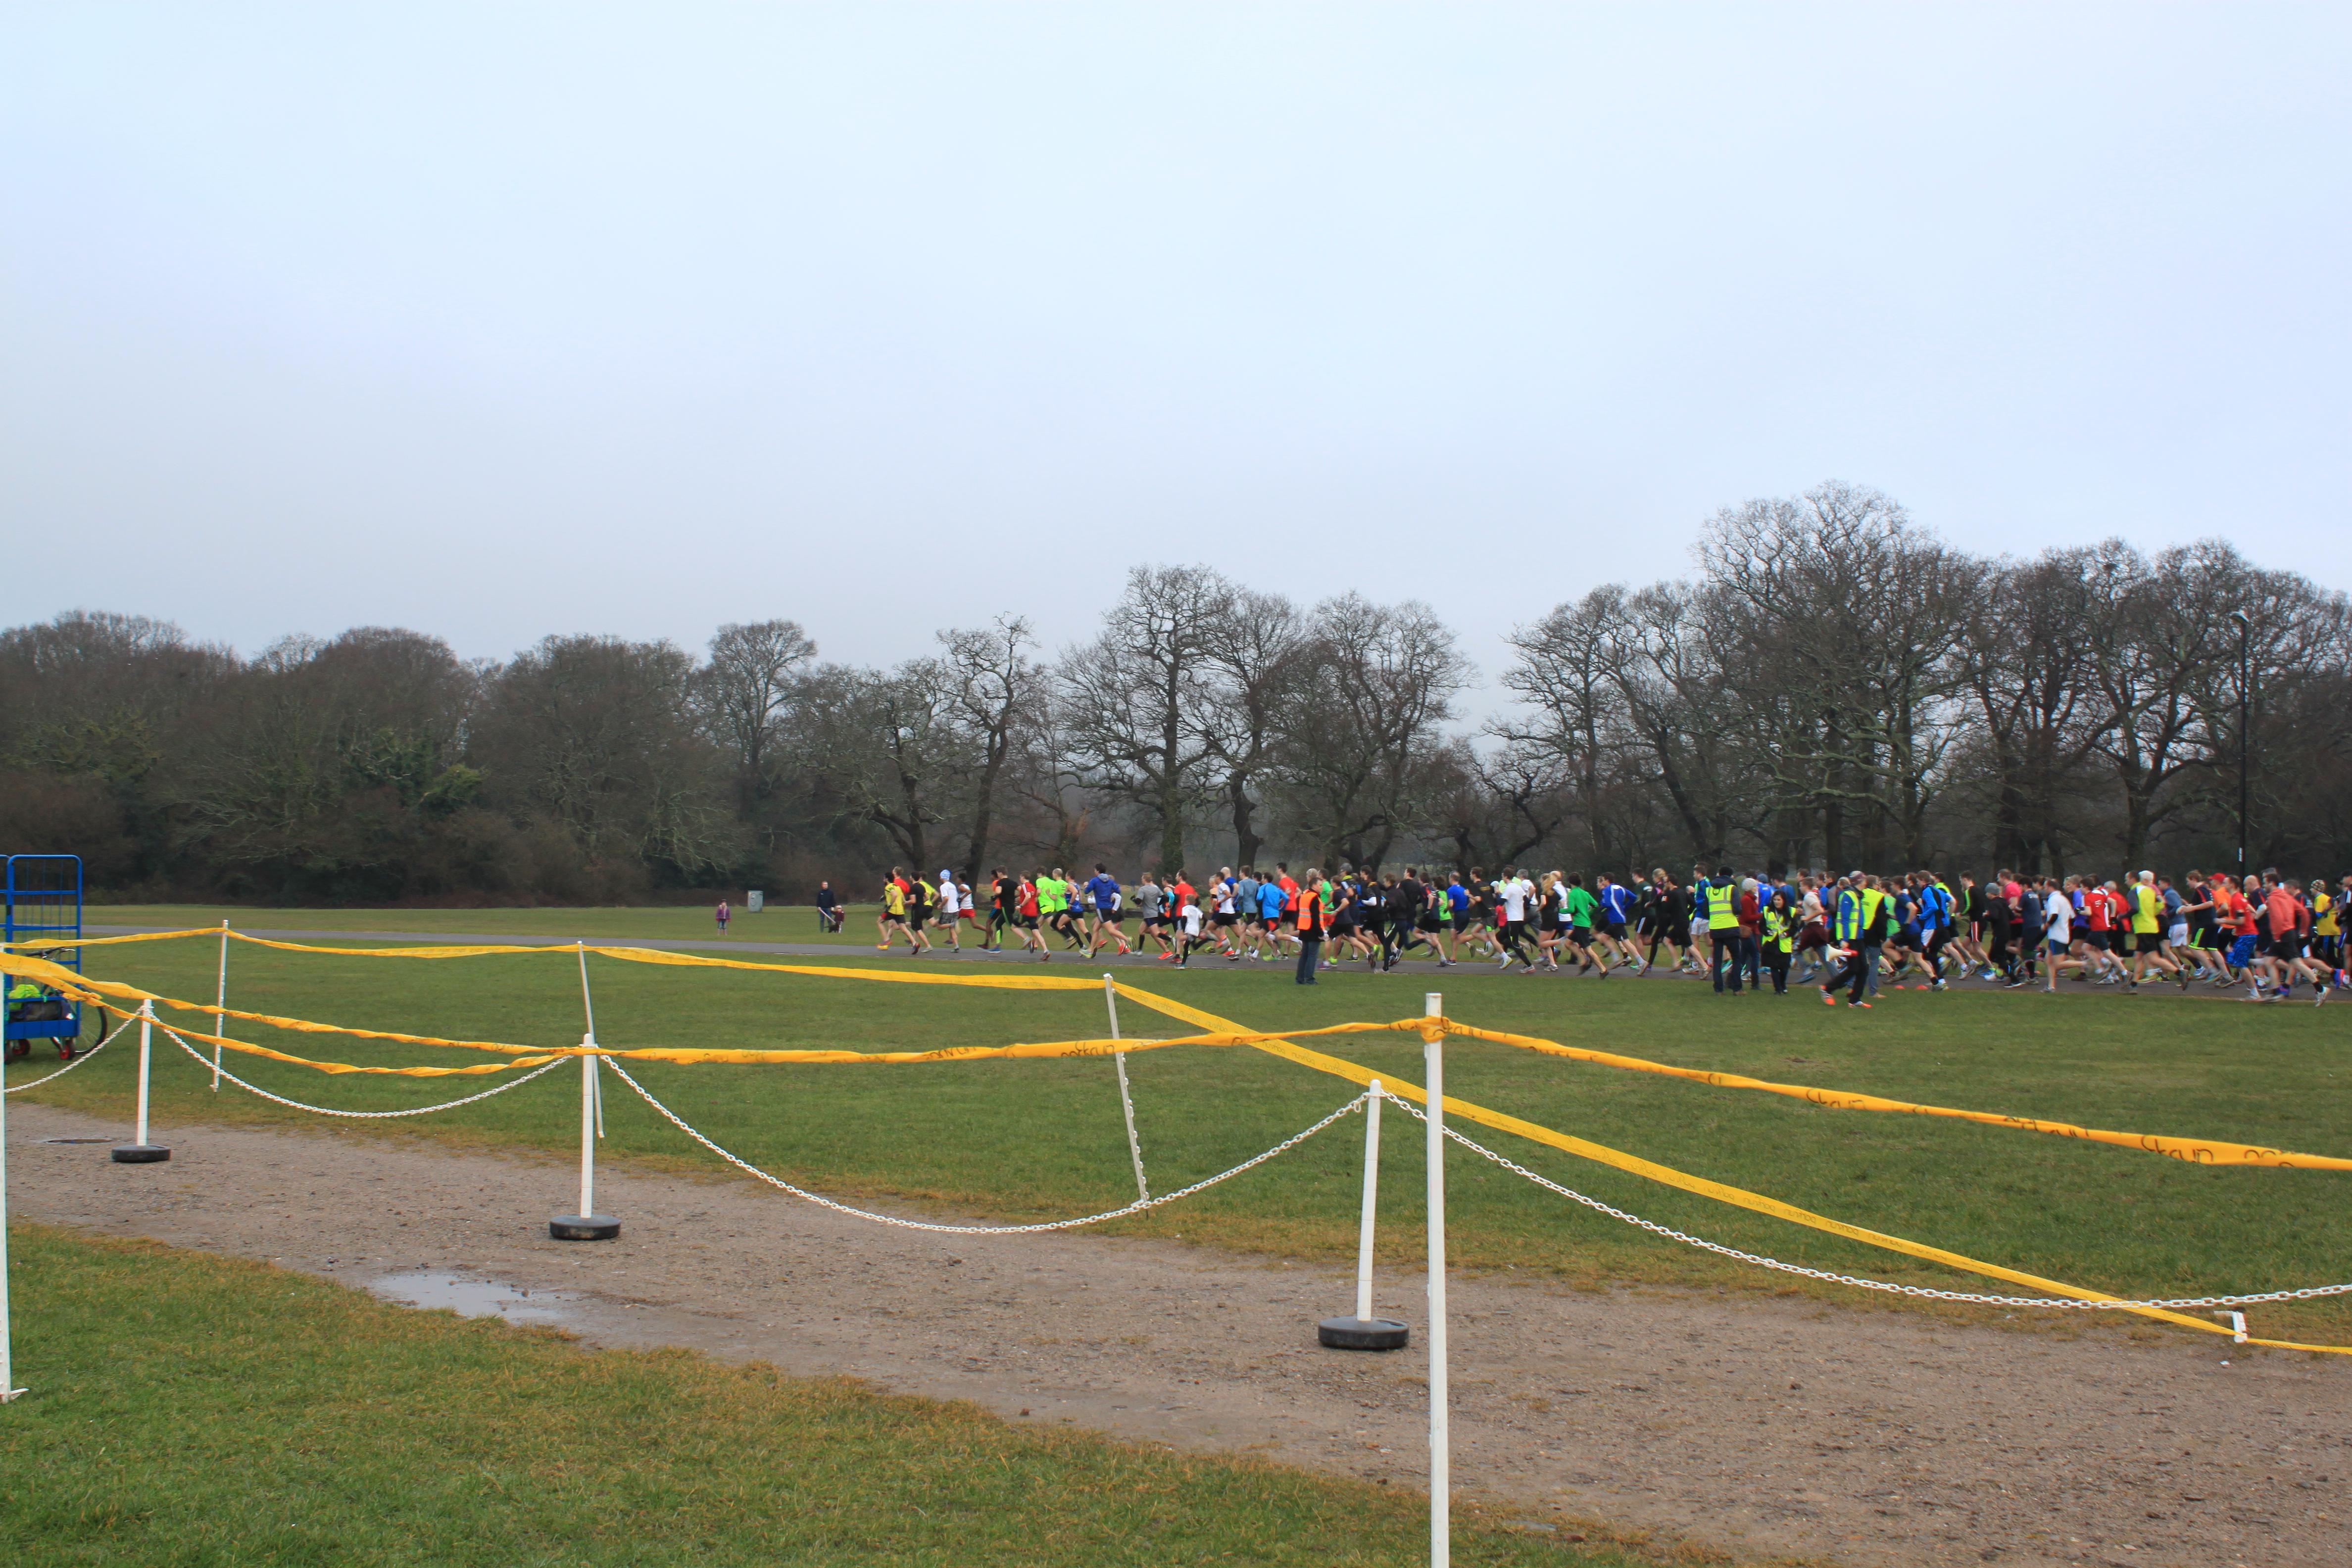 Entries for the ABP Southampton half marathon now closed